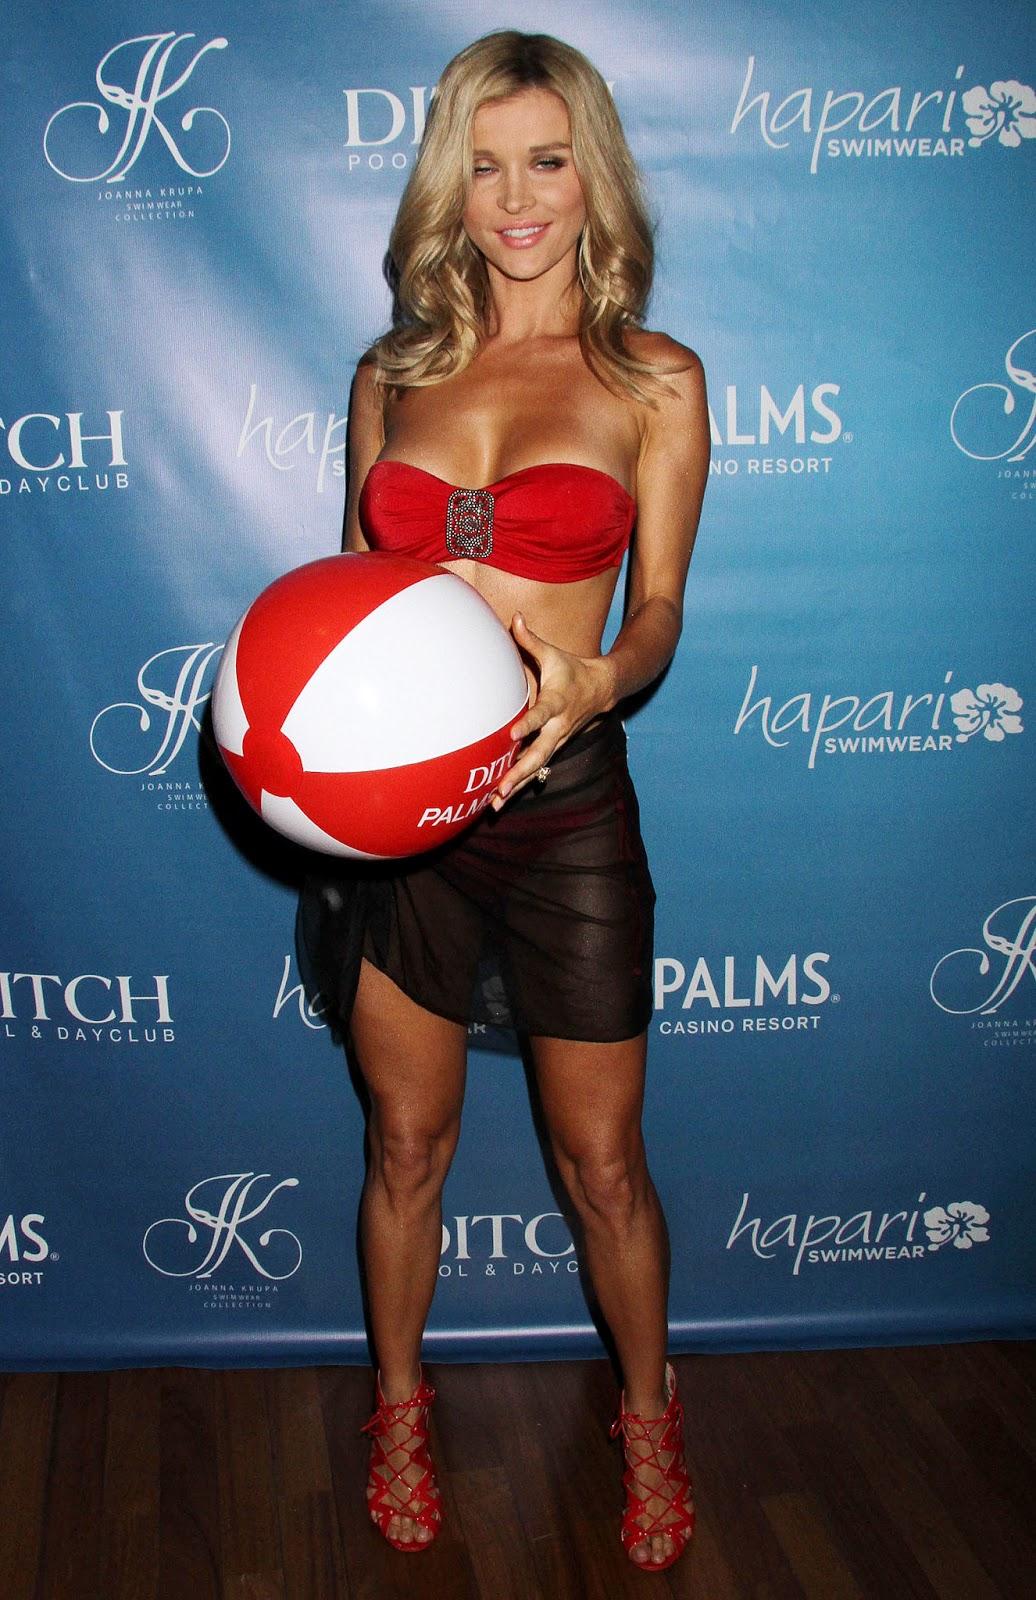 http://2.bp.blogspot.com/-wUMnOjSioFU/UbRuVx1LSaI/AAAAAAAAgK0/GdIylBbvX6Y/s1600/Joanna+Krupa+-+Bikini+Line+Launch+in+Las+Vegas+-+June+8,+2013+-03.JPG